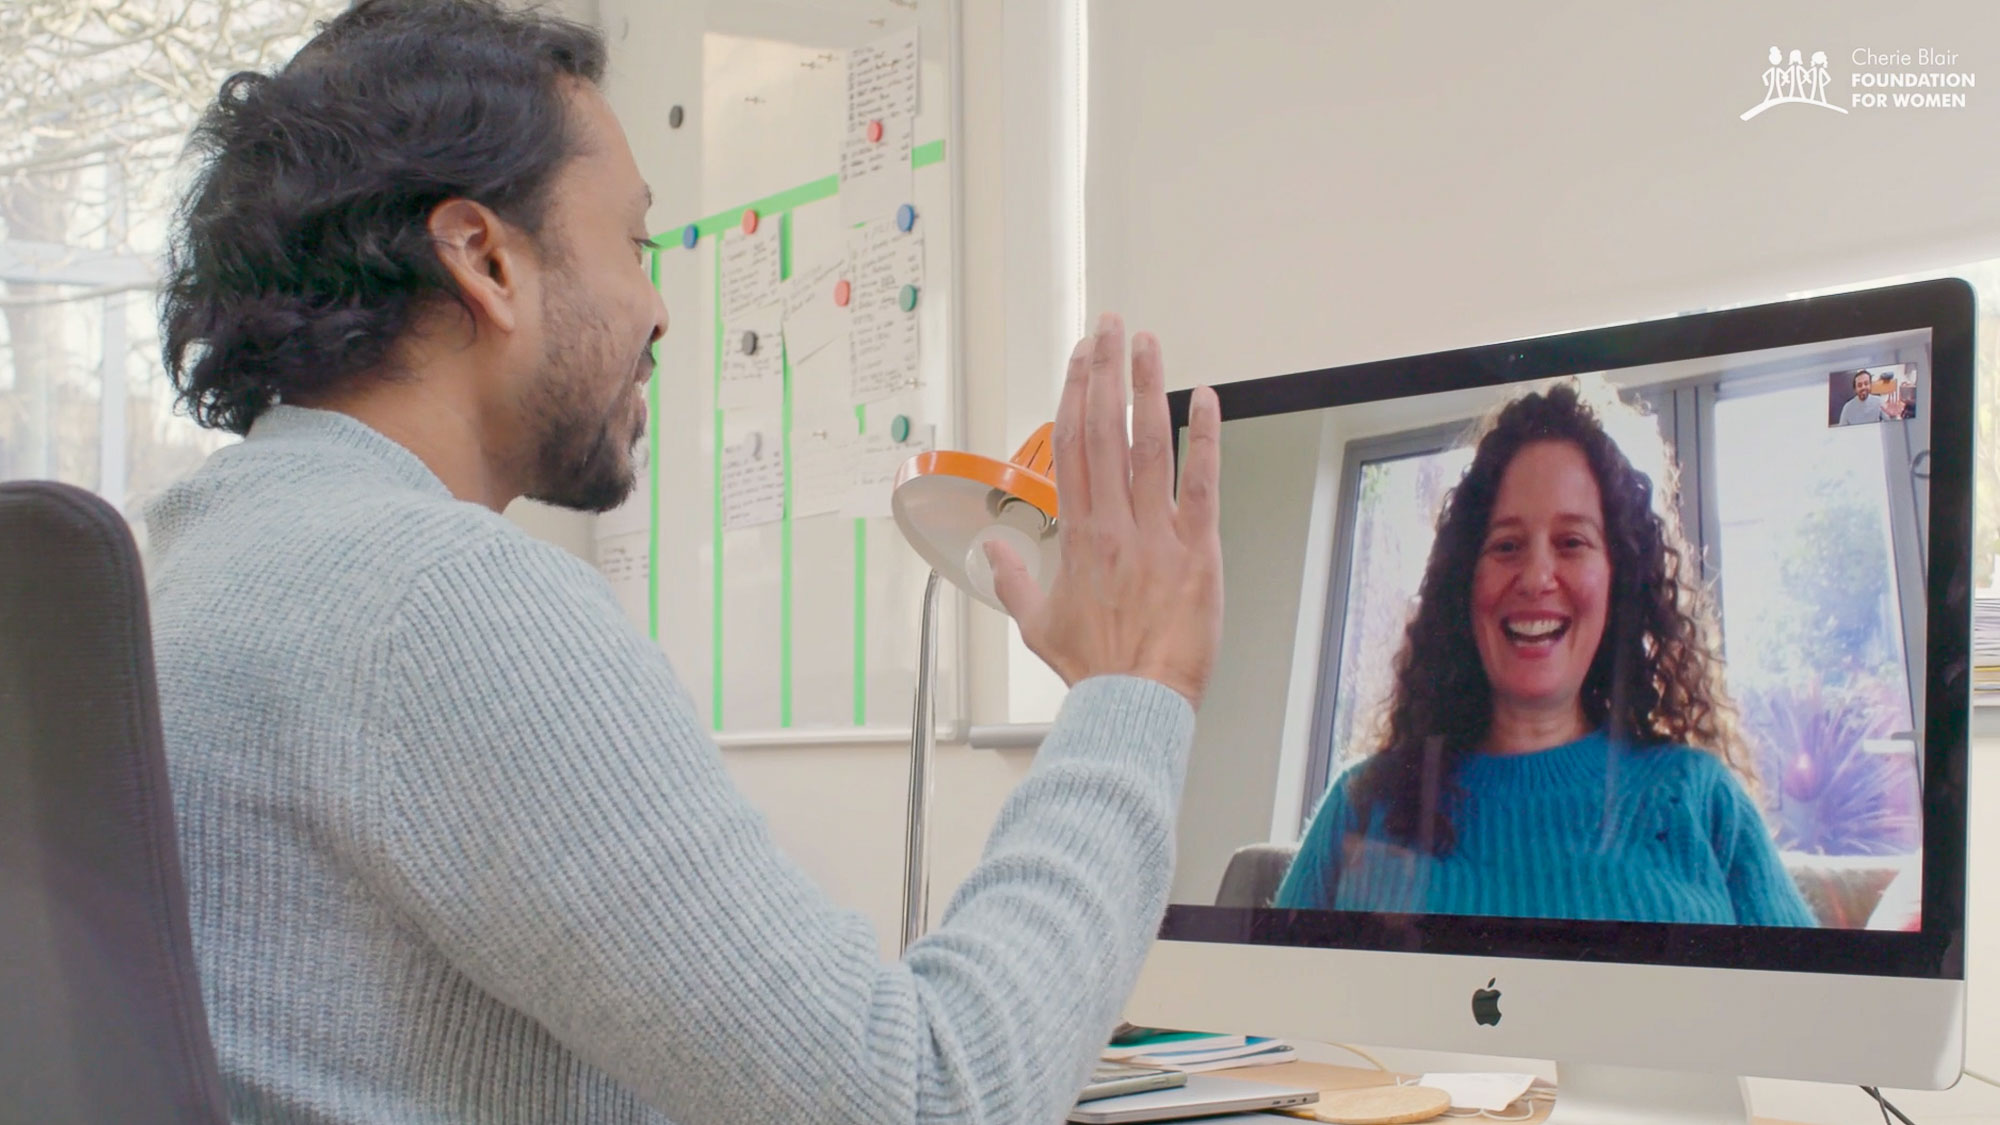 Training videos for international business